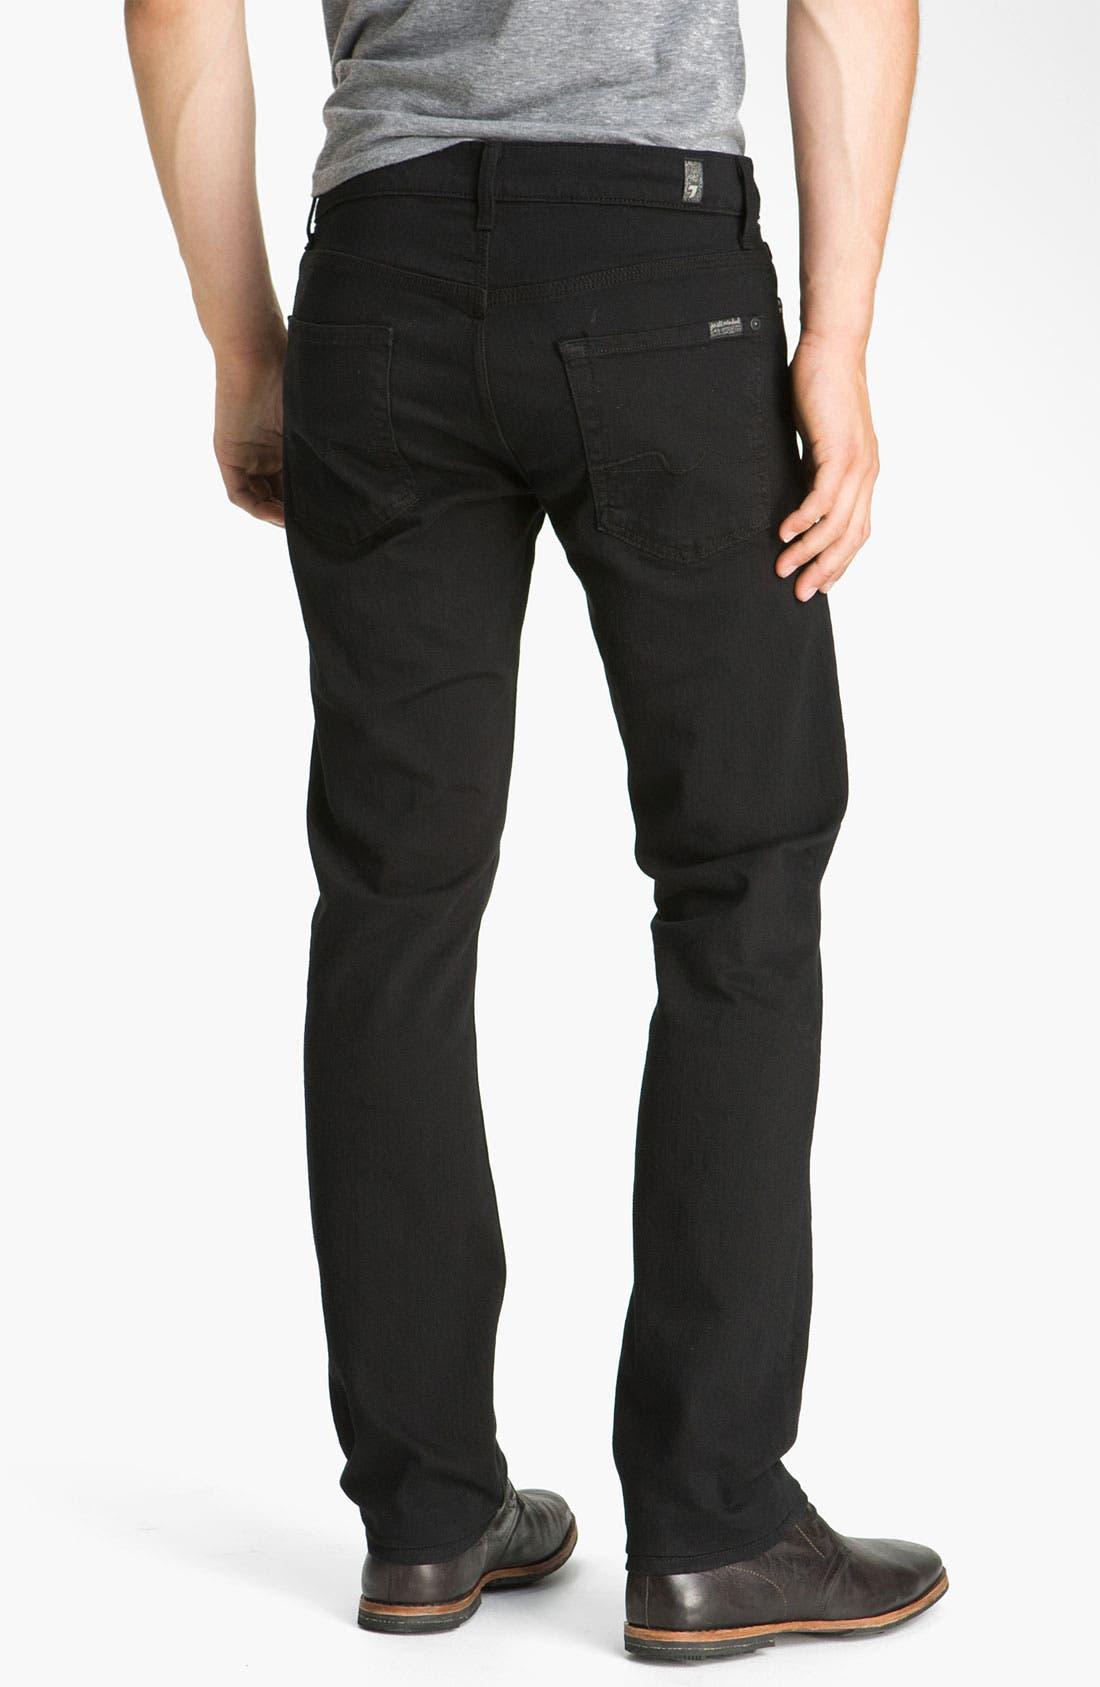 Alternate Image 2  - 7 For All Mankind® 'Slimmy' Slim Fit Jeans (Black Out)